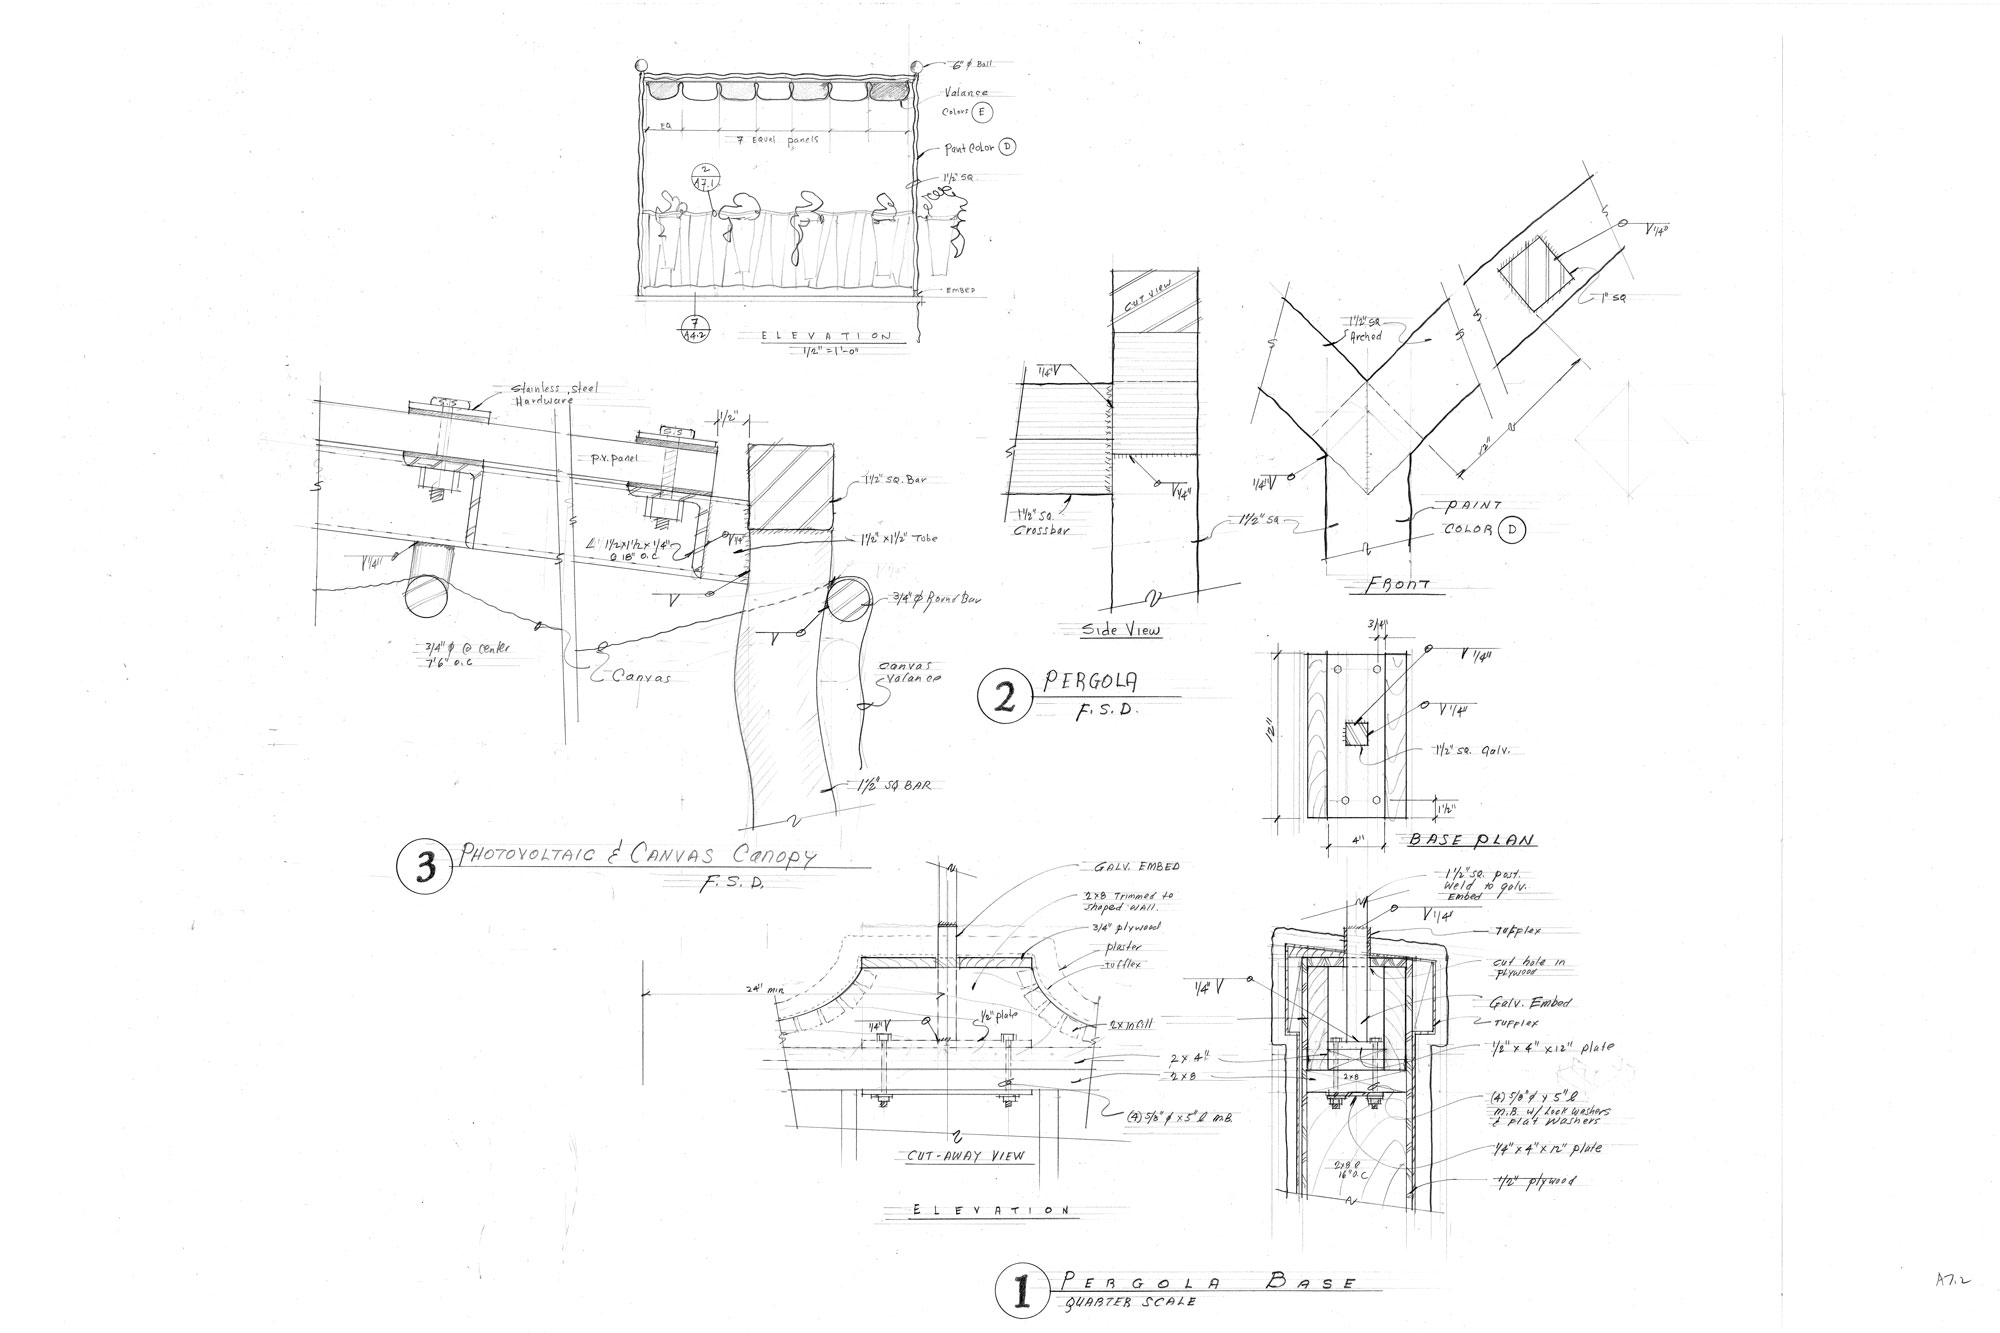 03.04.14-Pergola-Details.jpg